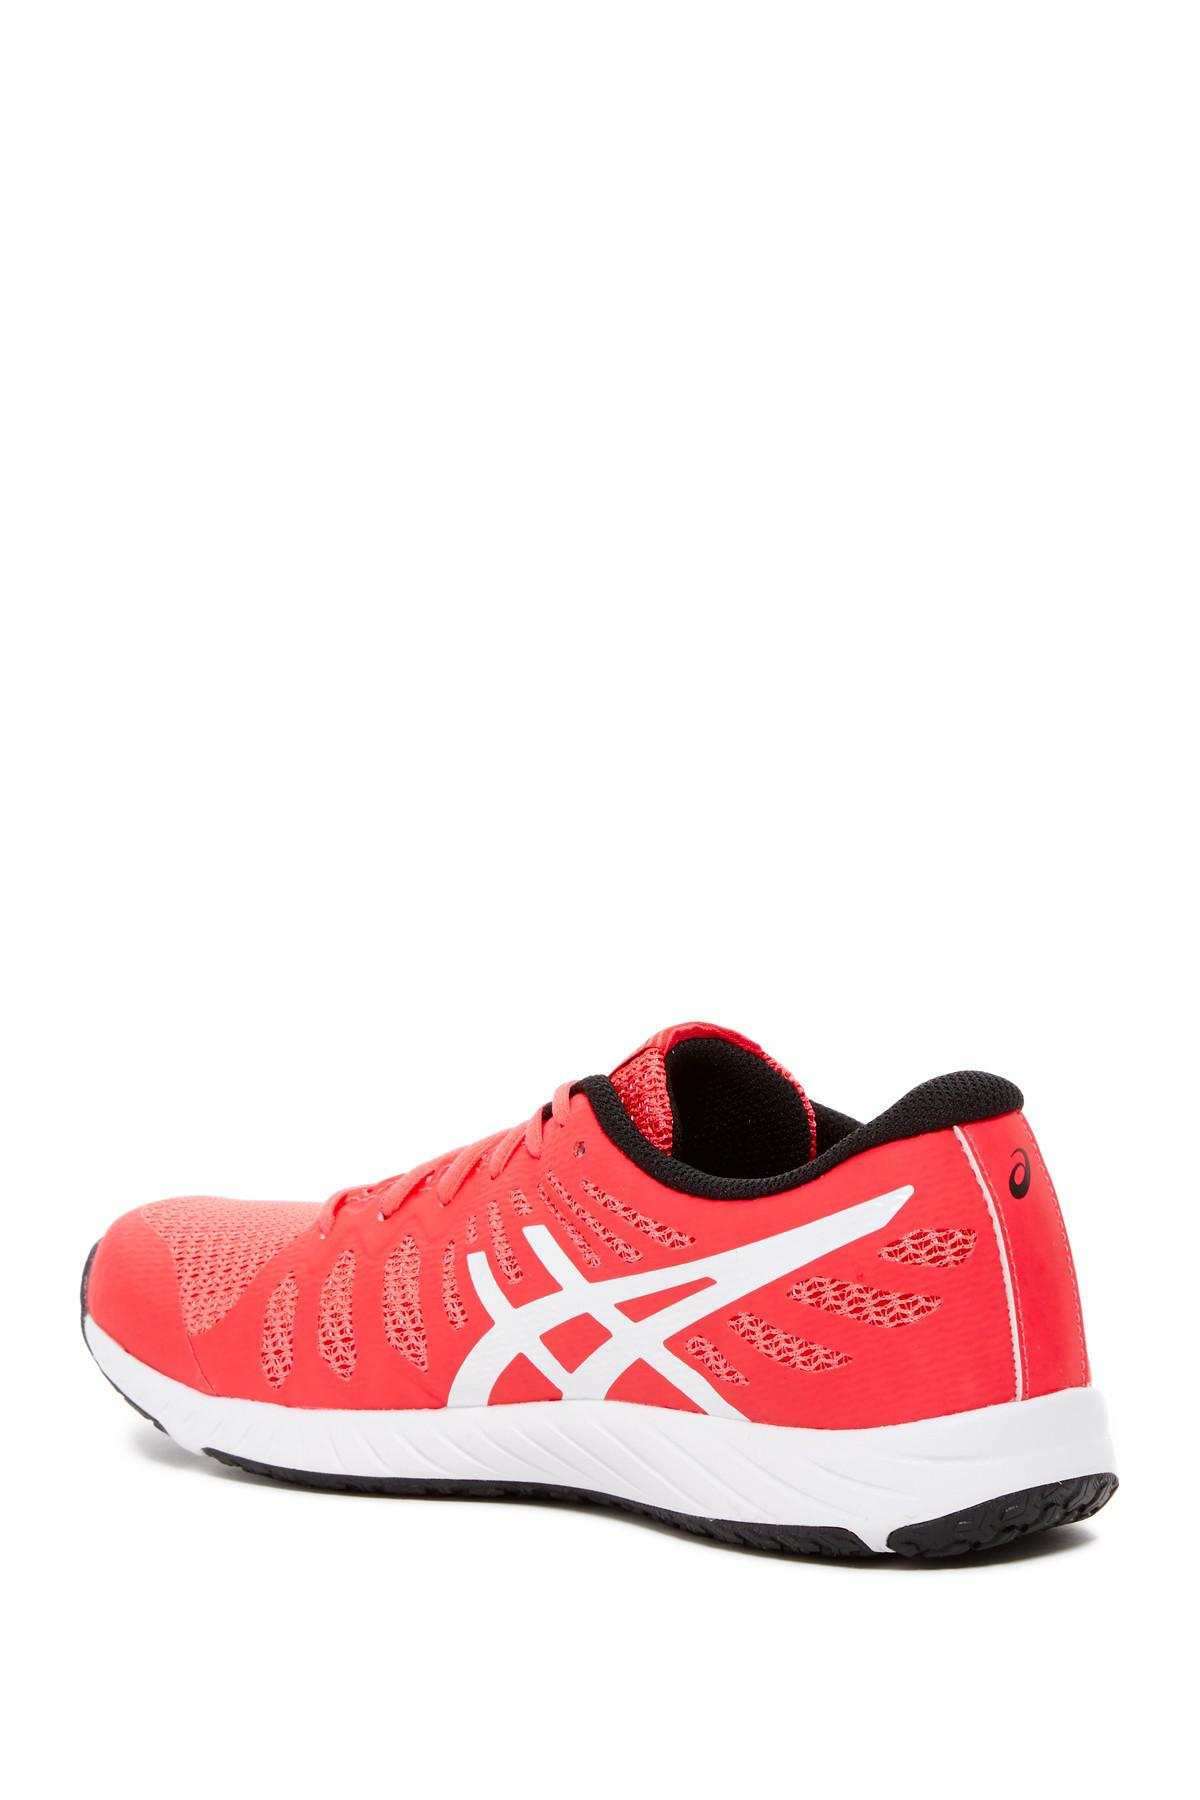 Sneaker Training 1857 Lyst Training Asics Gel nitrofuze pour Sneaker Homme 589c173 - e7z.info